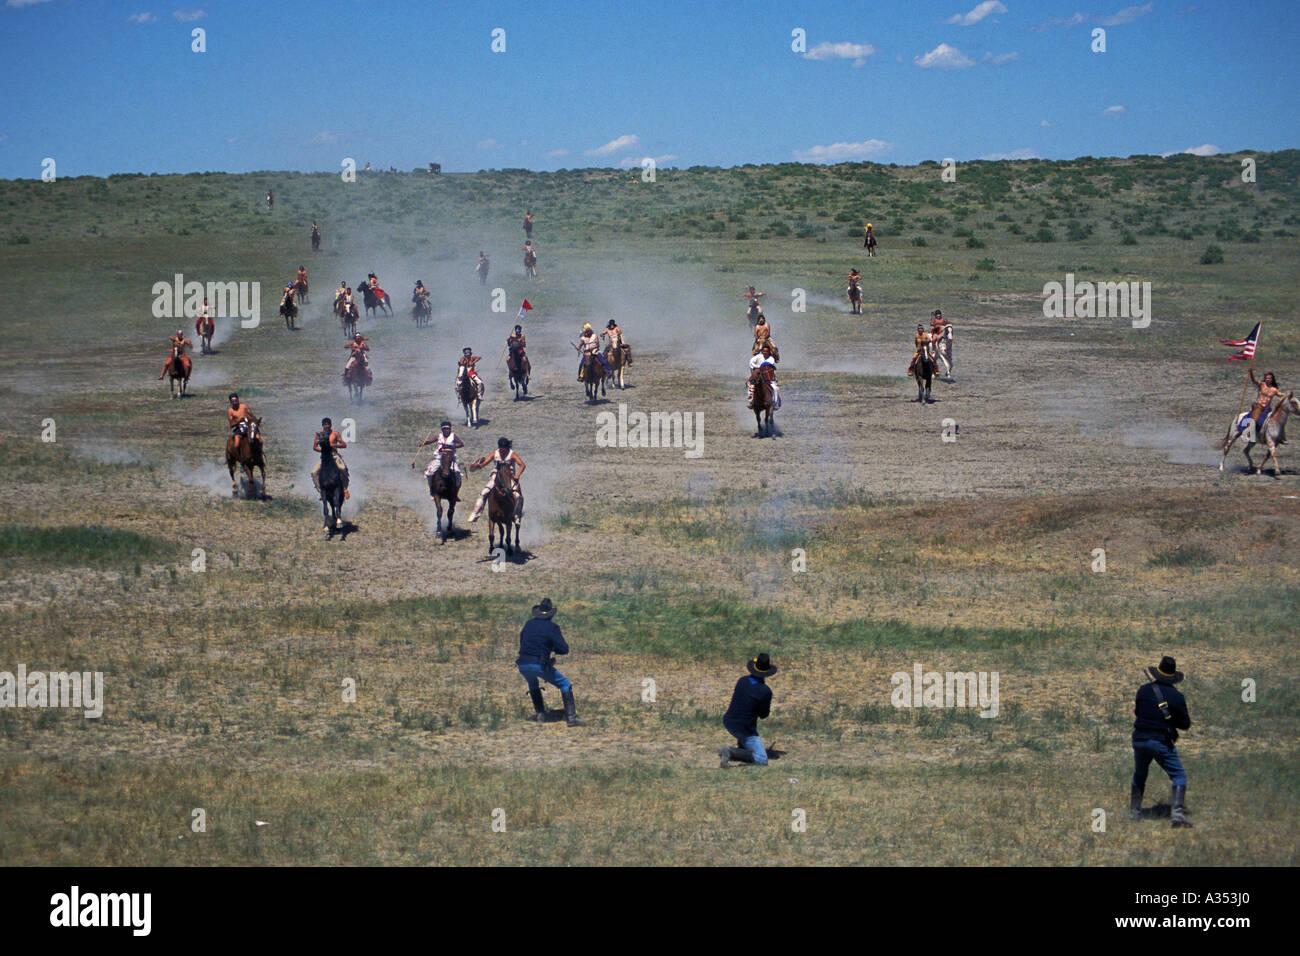 Little Bighorn Custer battle re enactment Crow Agency lands near Hardin Montana USA Stock Photo